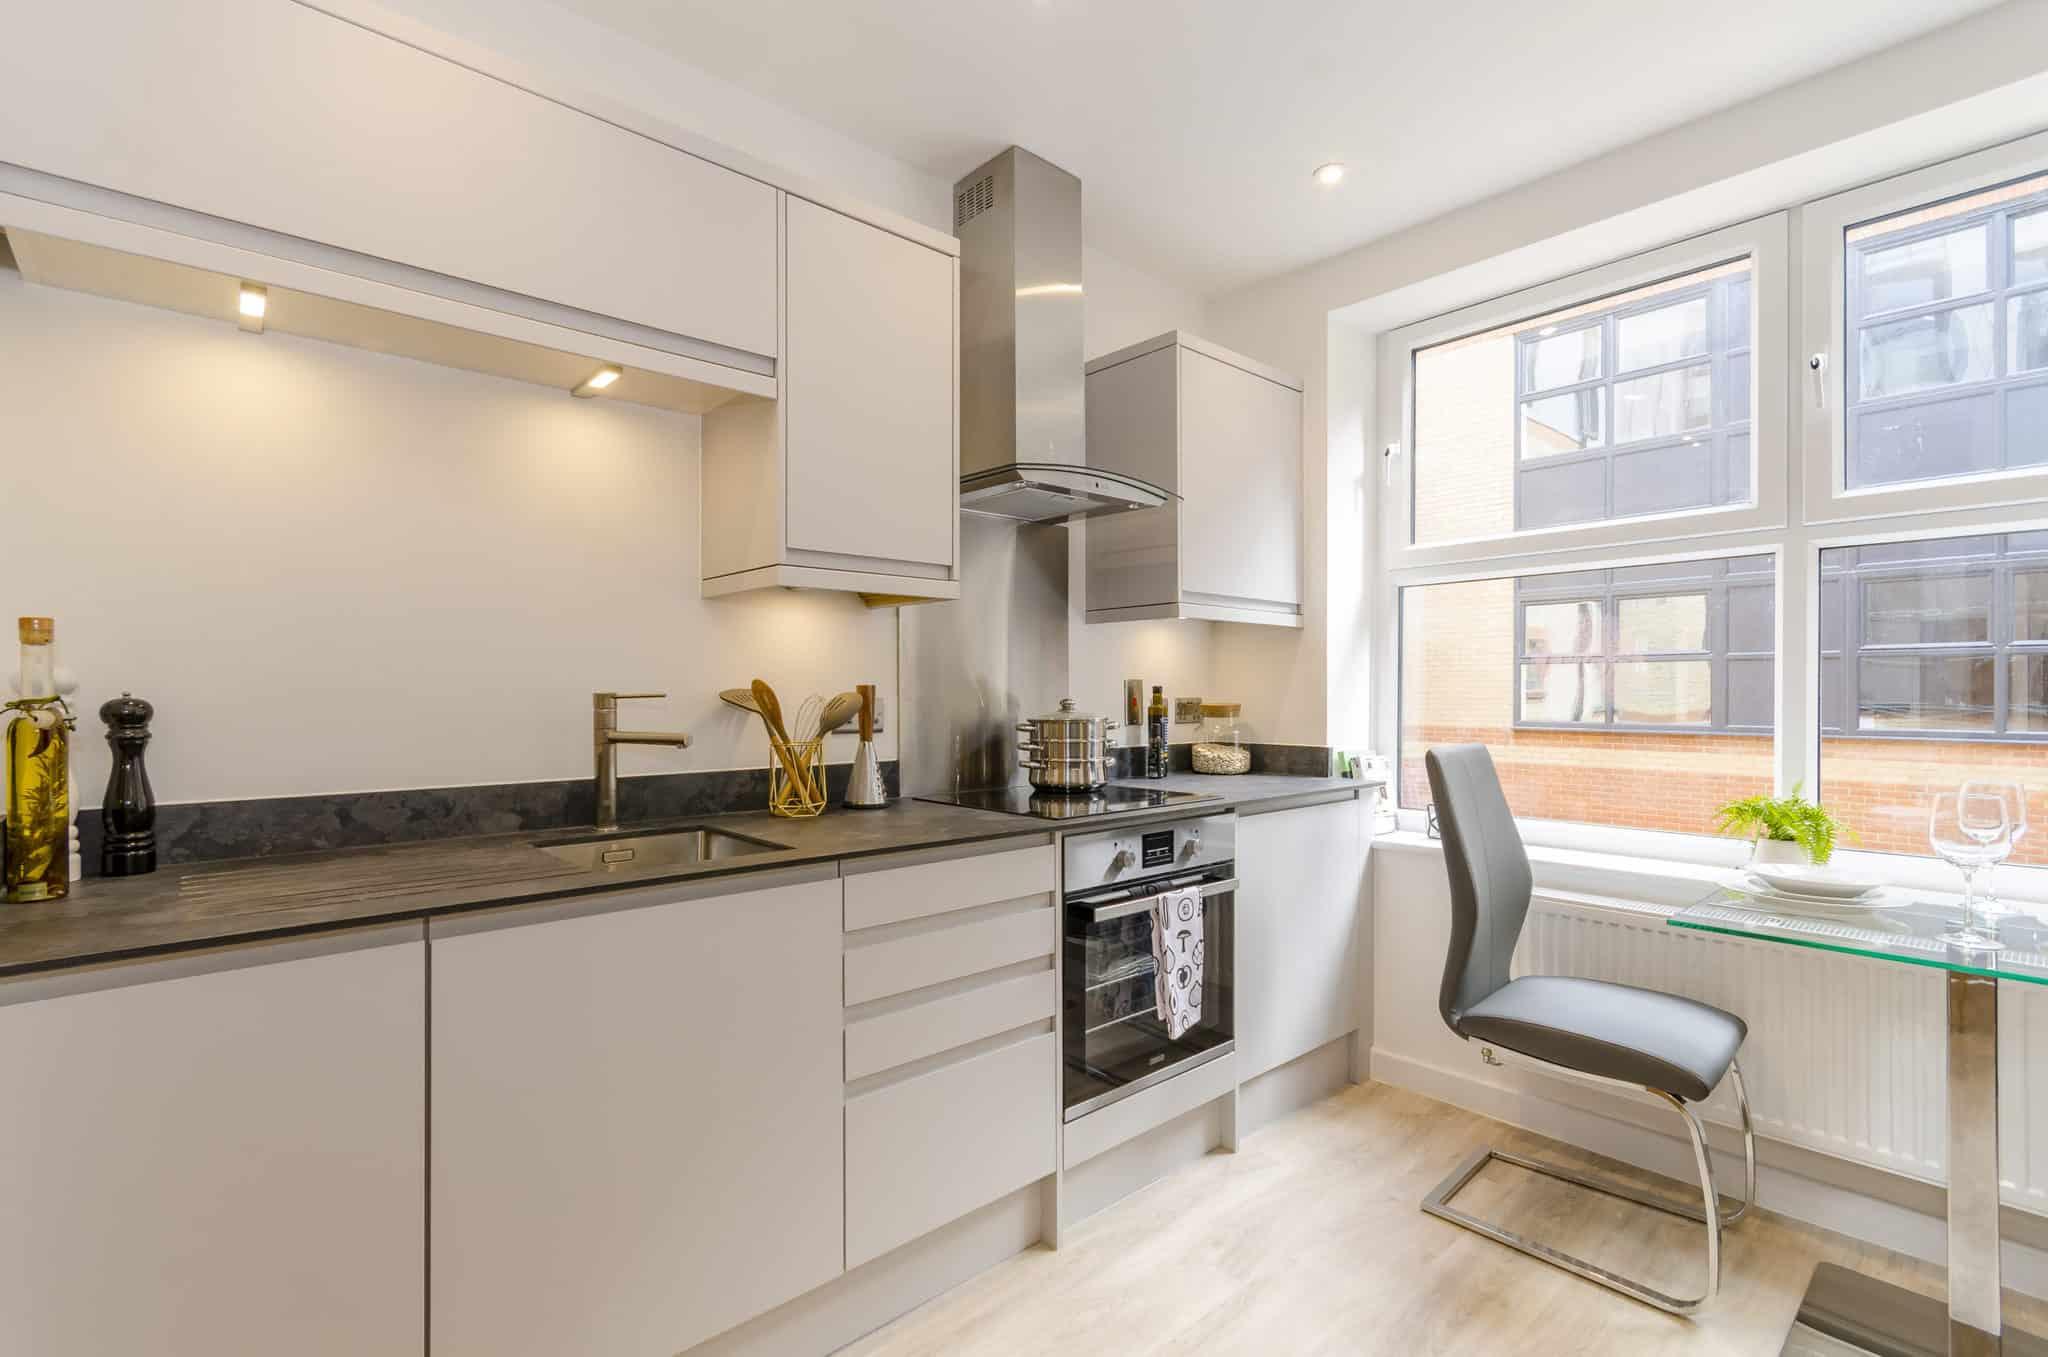 Saxon Gate Southampton Interior: Commercial to Residential Property Conversion Apartment